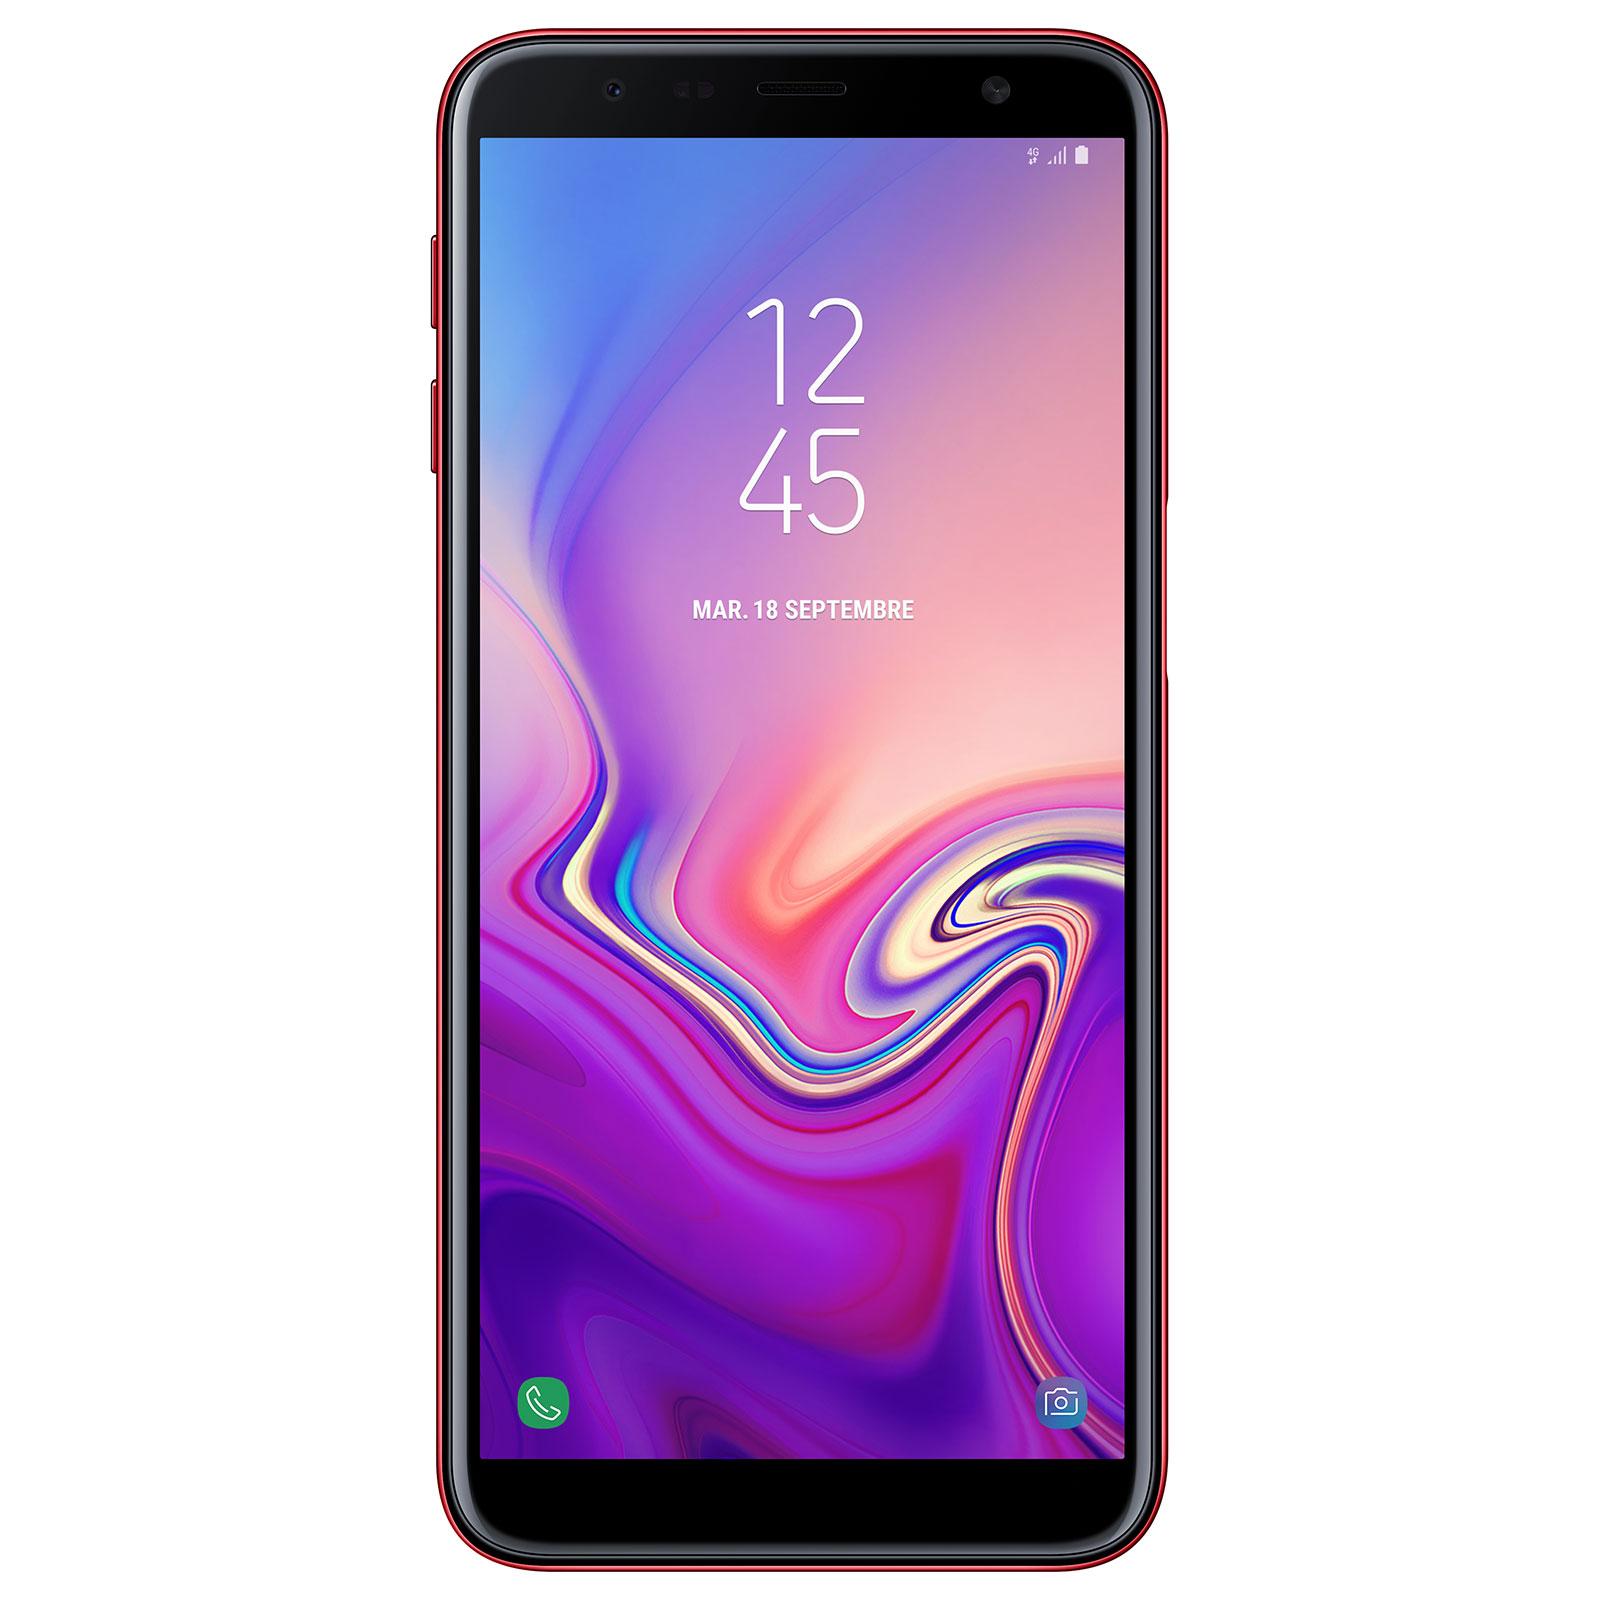 "Mobile & smartphone Samsung Galaxy J6+ Rouge Smartphone 4G-LTE Dual SIM - Snapdragon 425 Quad-Core 1.4 Ghz - RAM 3 Go - Ecran tactile 6"" 720 x 1480 - 32 Go - NFC/Bluetooth 4.2 - 3300 mAh - Android 8.1"